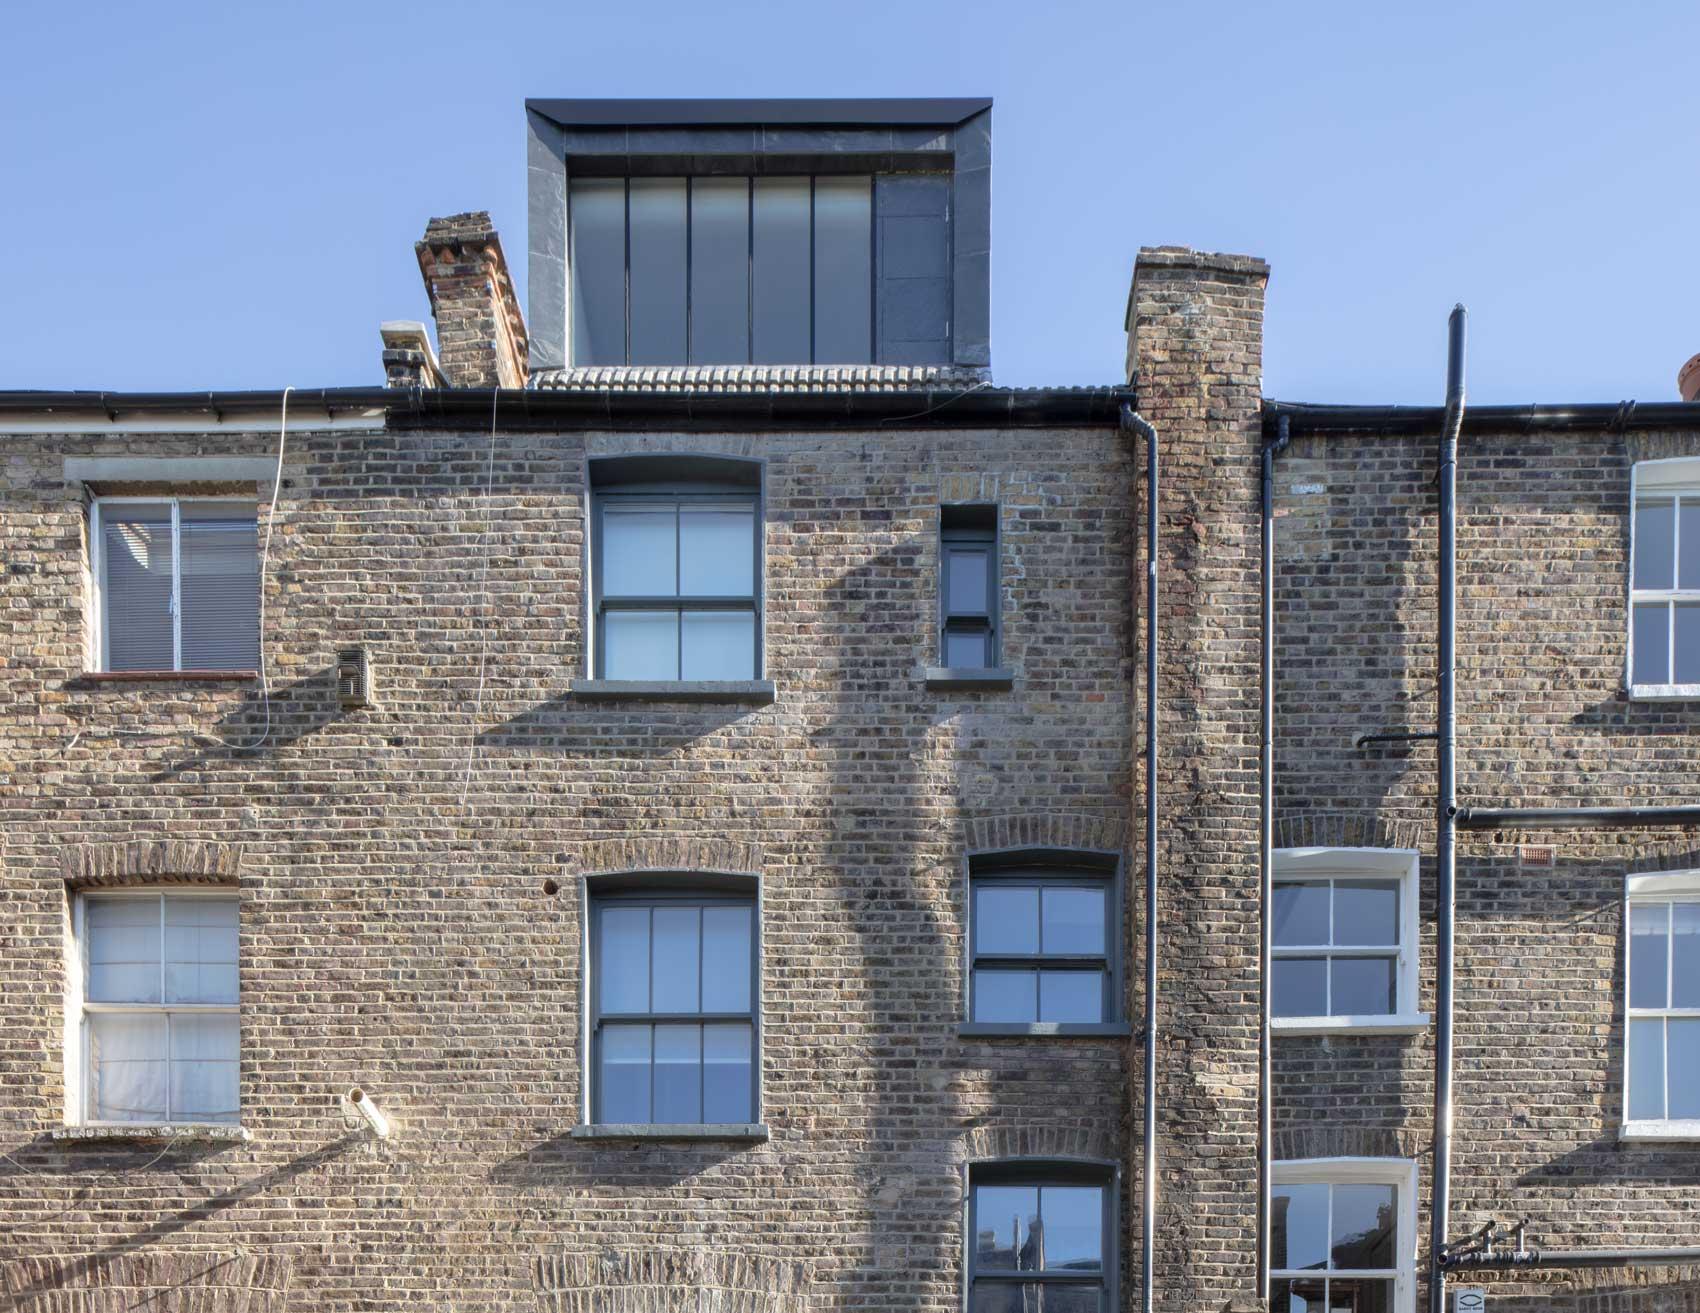 Loft Conversion Costs Calculator For 2019 Architecture For London